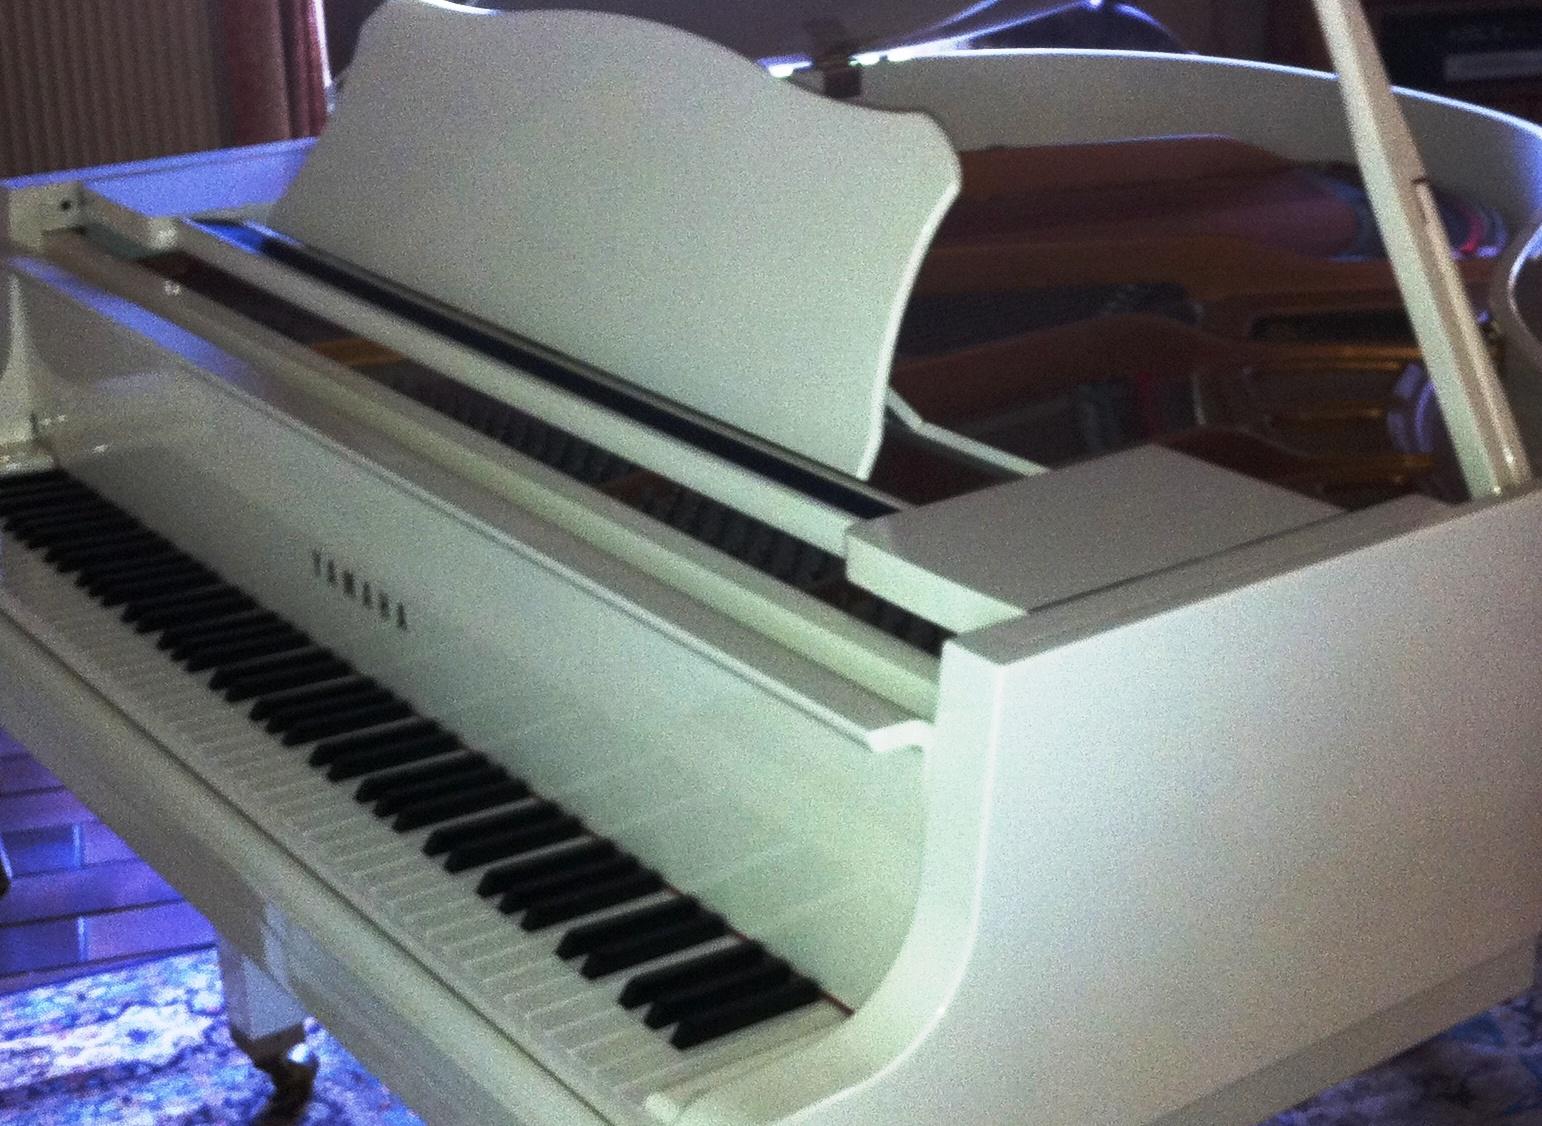 photo yamaha gh1 yamaha piano 1 4 de queue type gh1 blanc 642540 audiofanzine. Black Bedroom Furniture Sets. Home Design Ideas